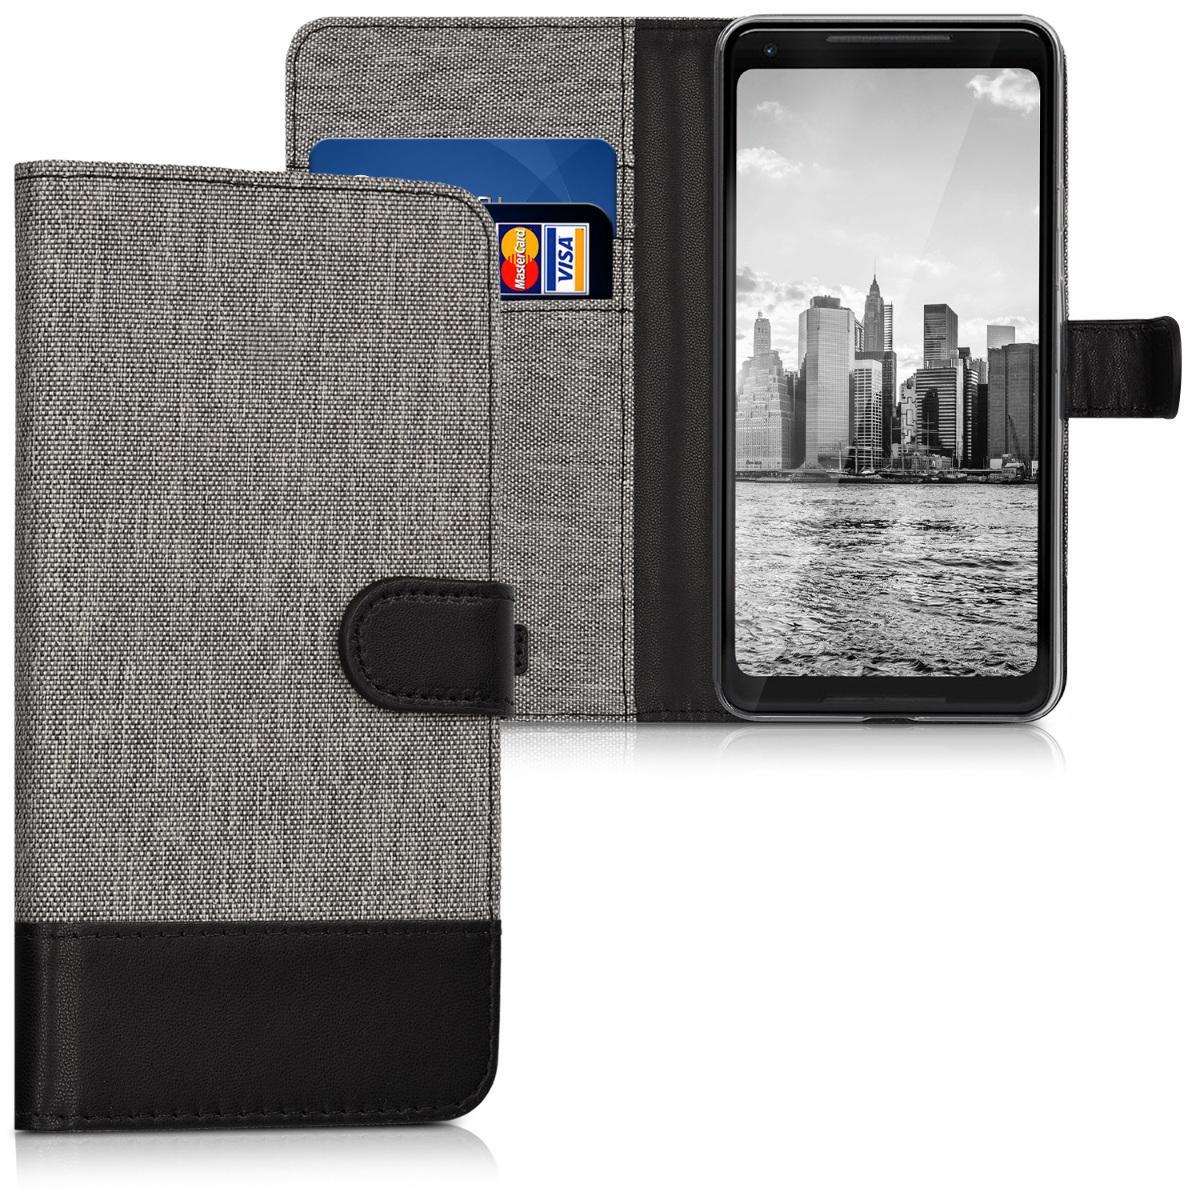 KW Θήκη Πορτοφόλι Google Pixel 2 XL - Grey / Black (43355.22)